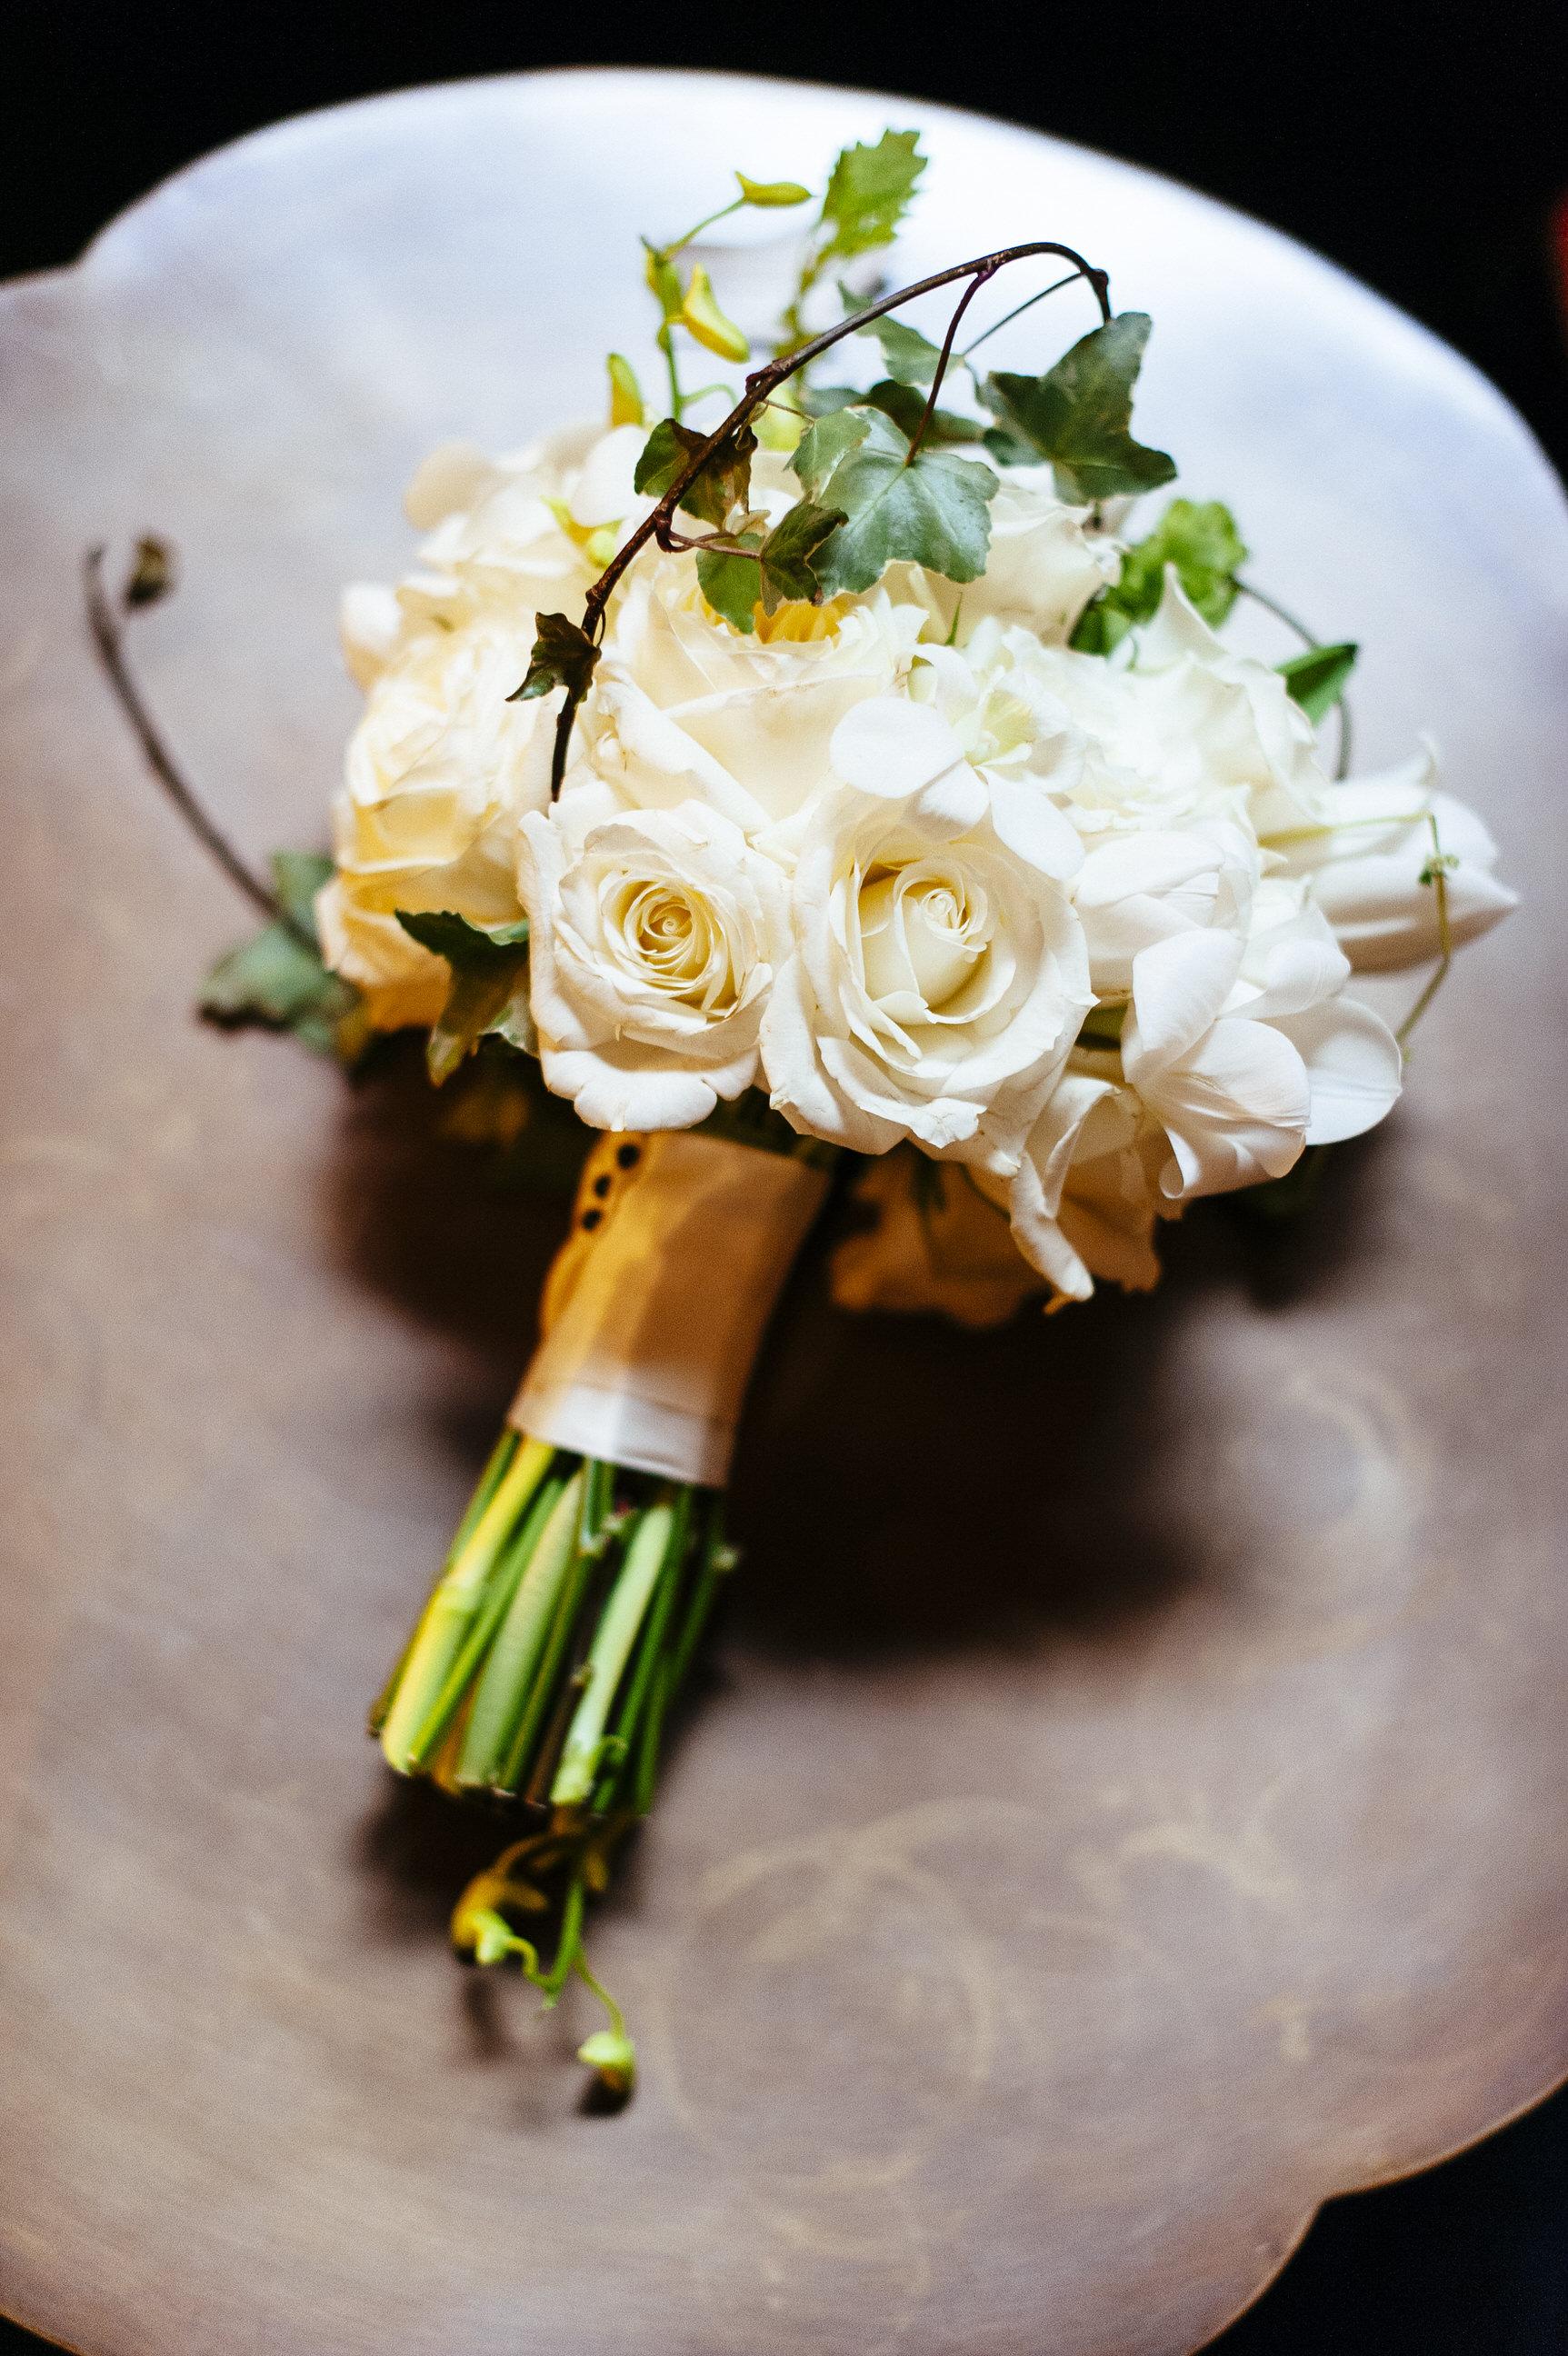 22 Hotel DuPont Wedding Brides Bouquet Wilmington Wedding Florist.jpg